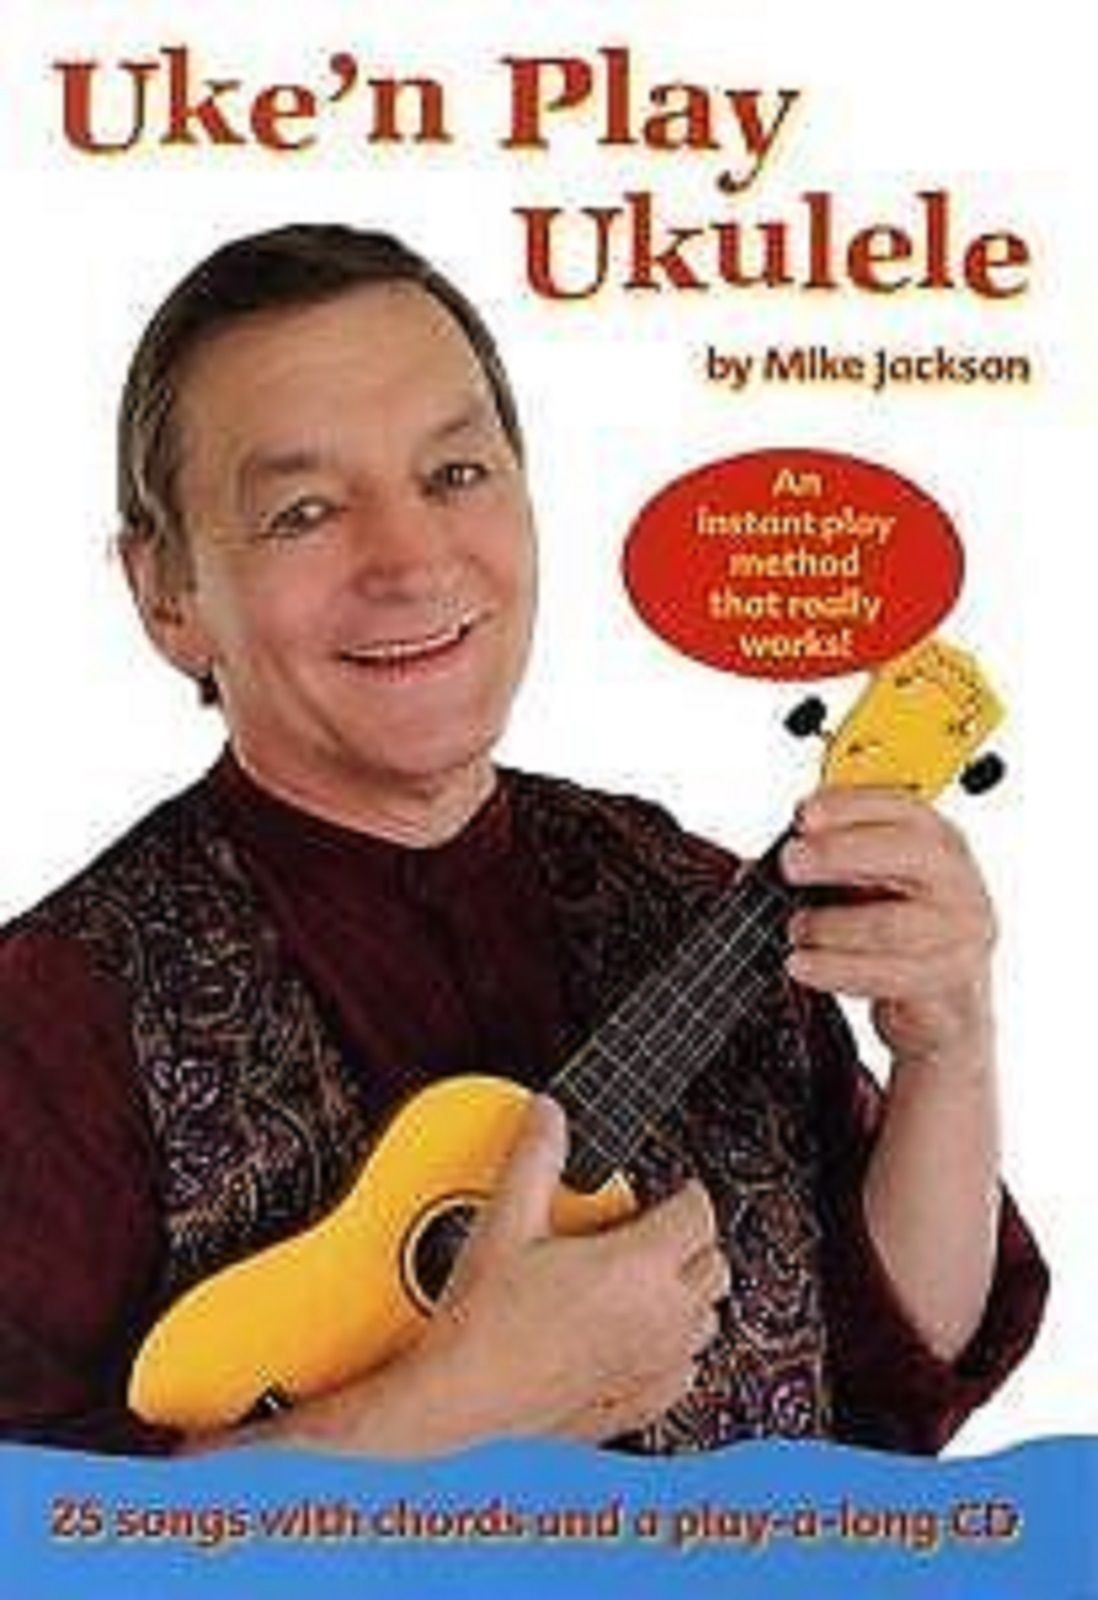 Uke'n Play Ukulele Instant Play Method Tutor Chords Lyrics Book CD S70